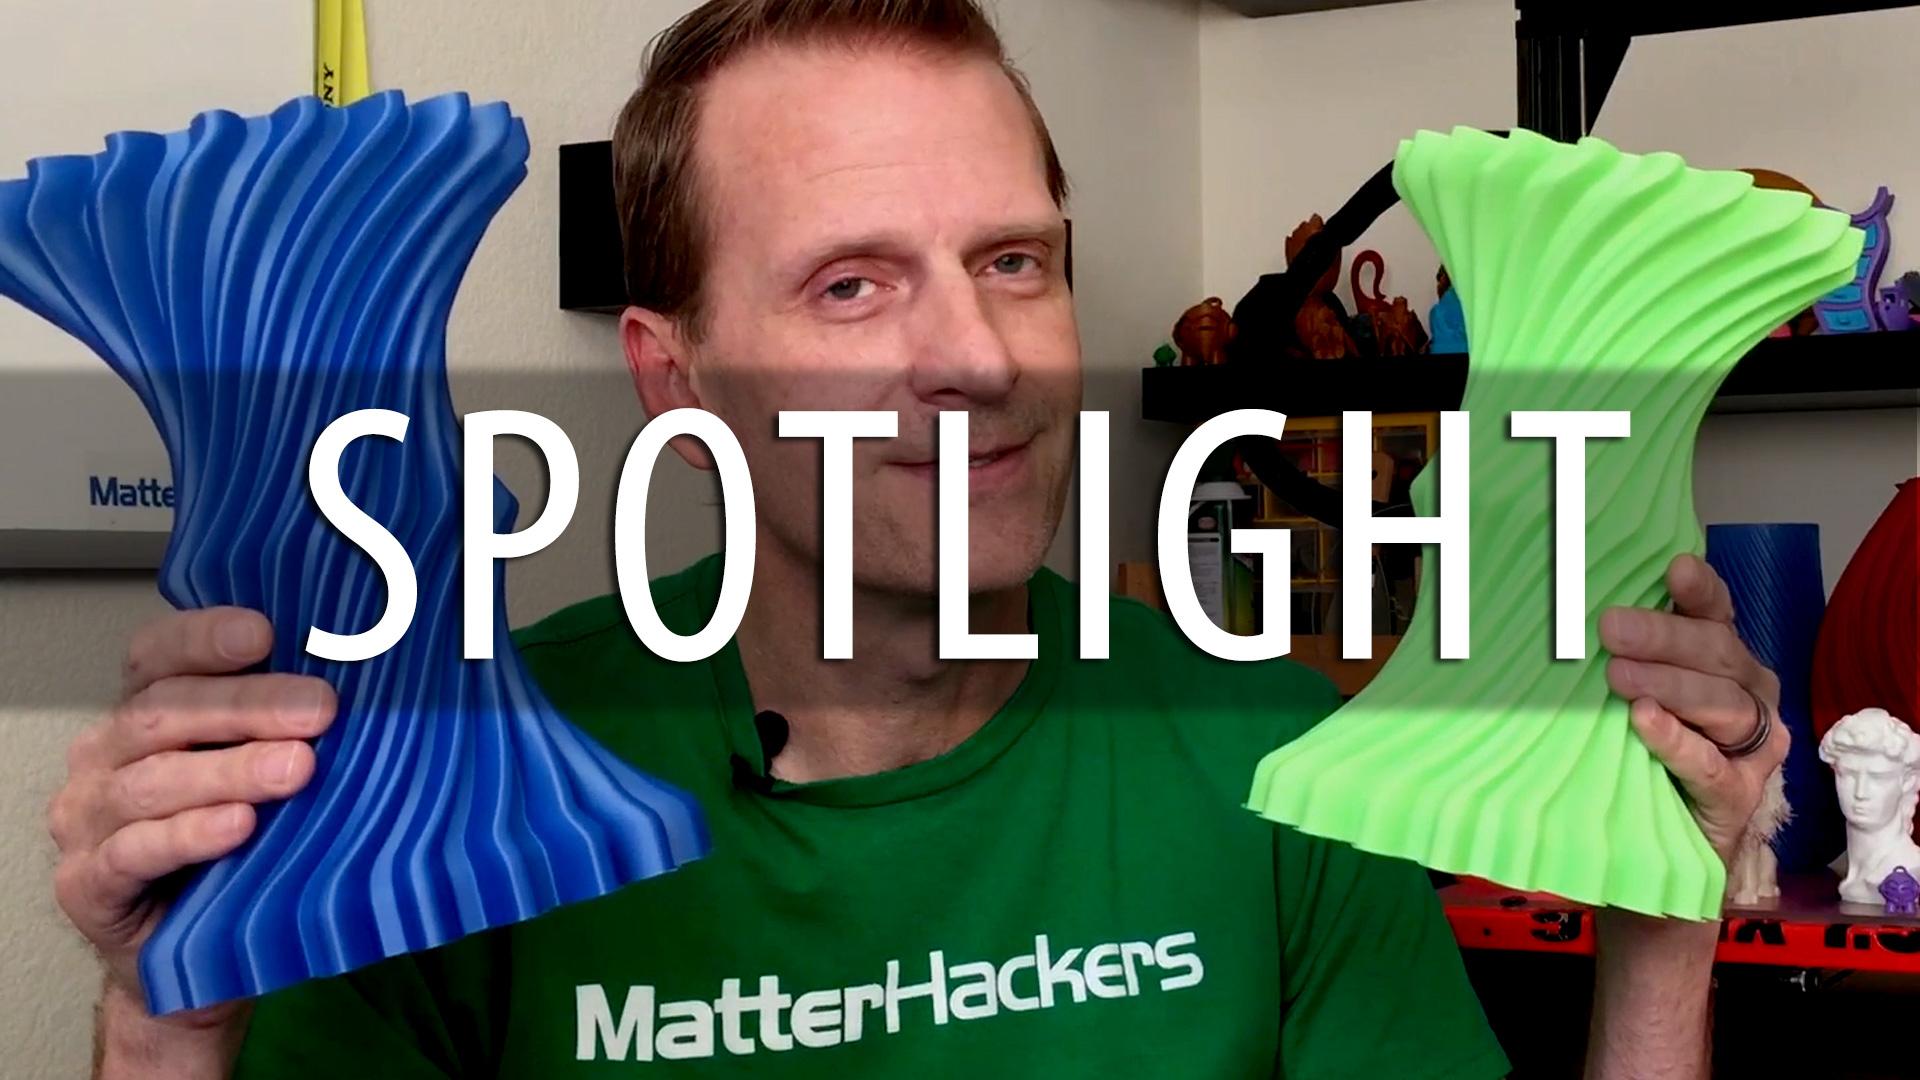 3D Printing Spotlight: Print 3D Channel